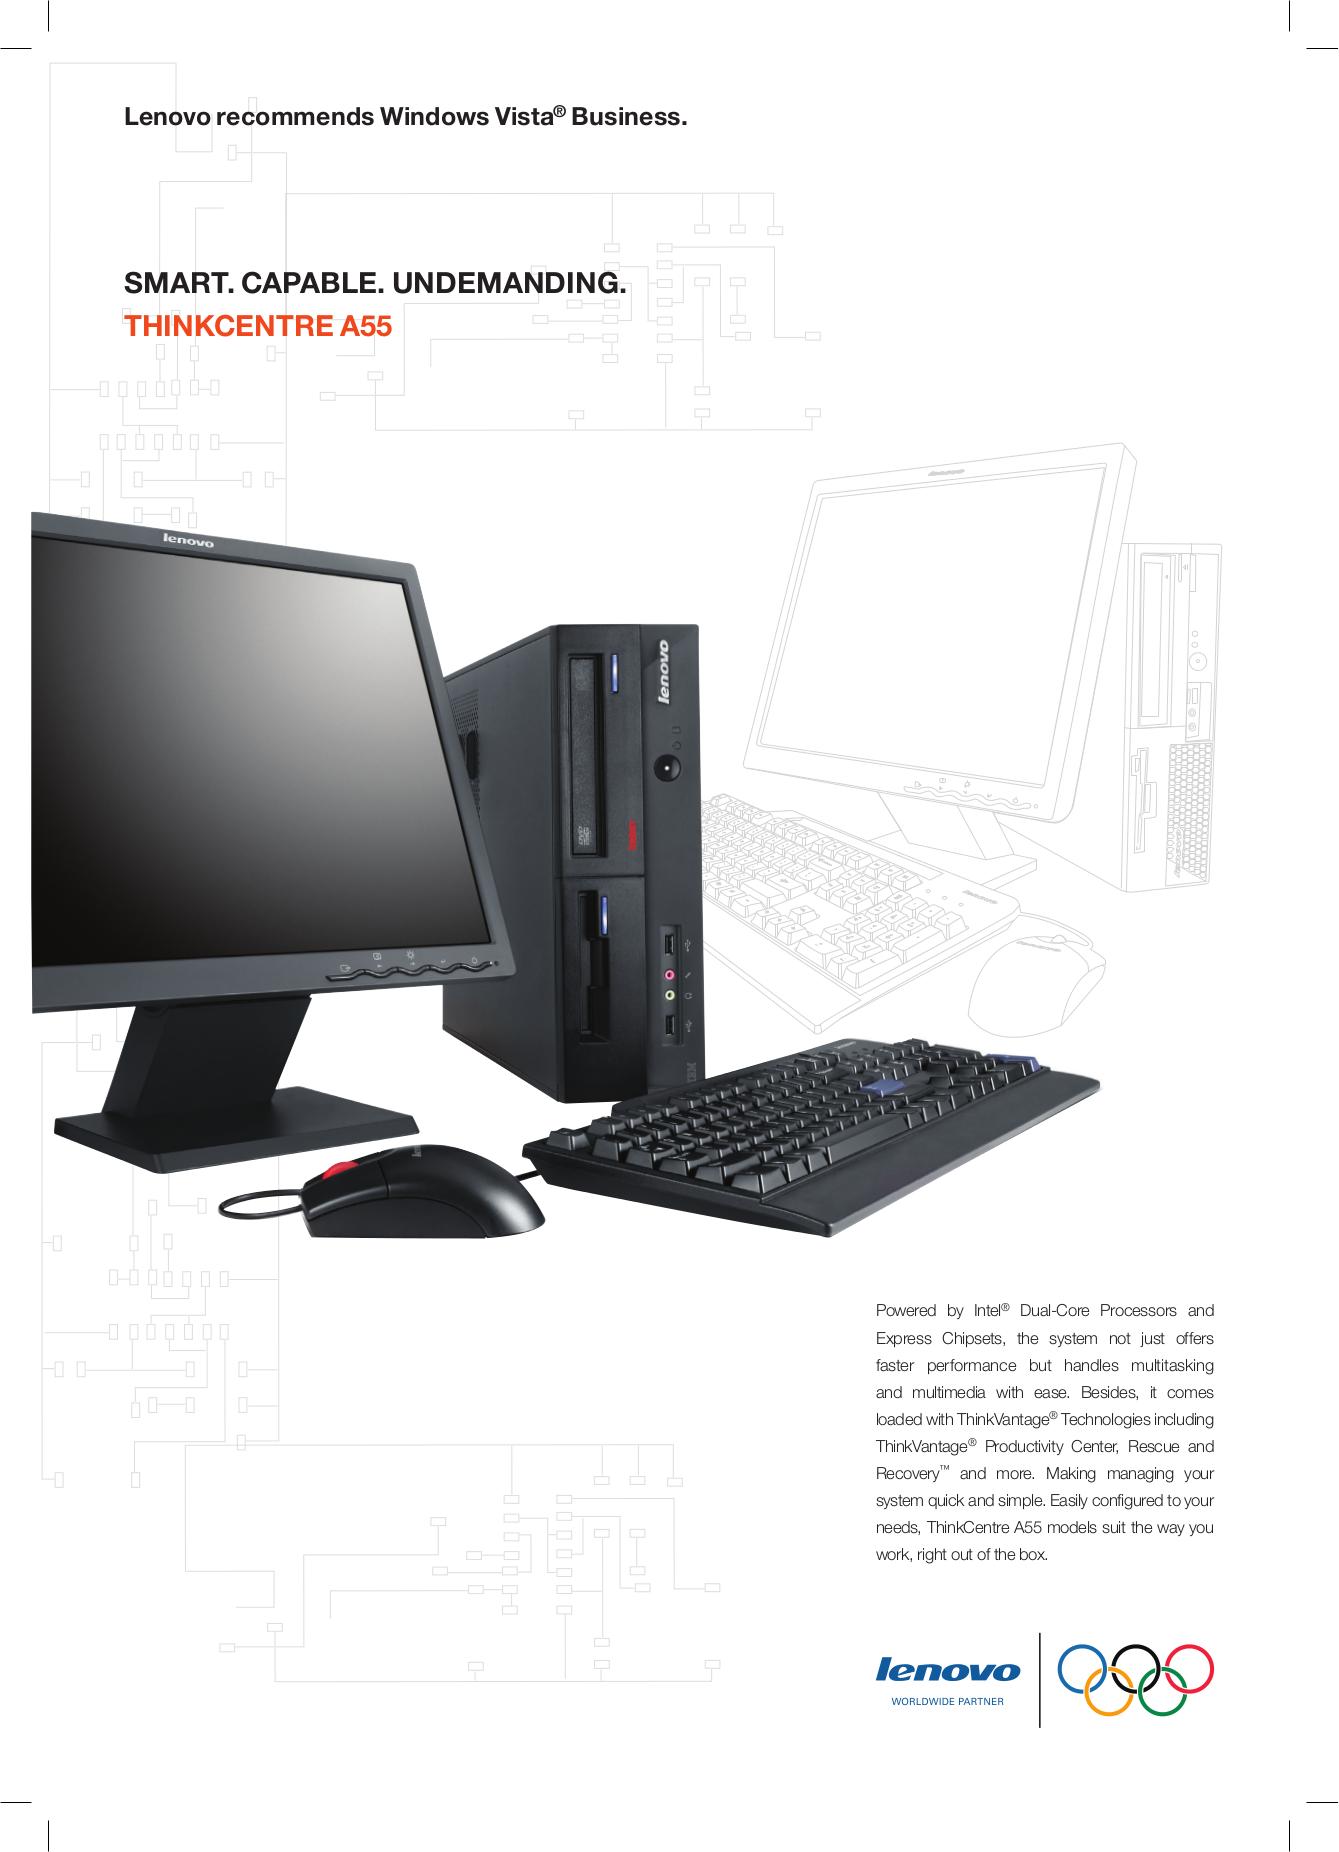 pdf for Lenovo Desktop ThinkCentre A55 8985 manual